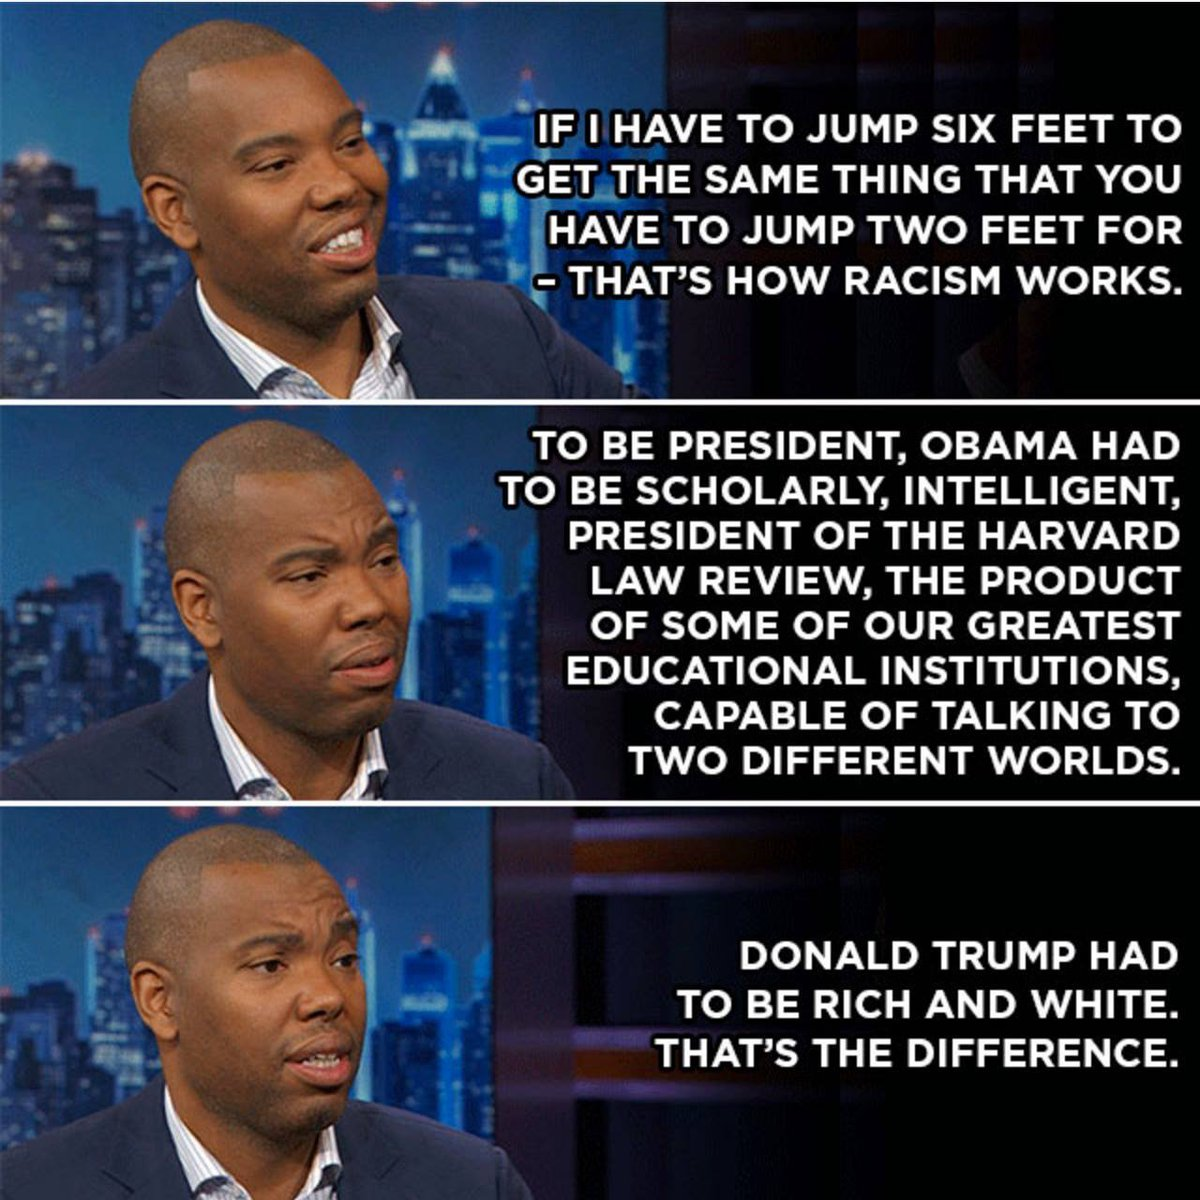 Donald Trump's white privilege.  — @tanehisicoates